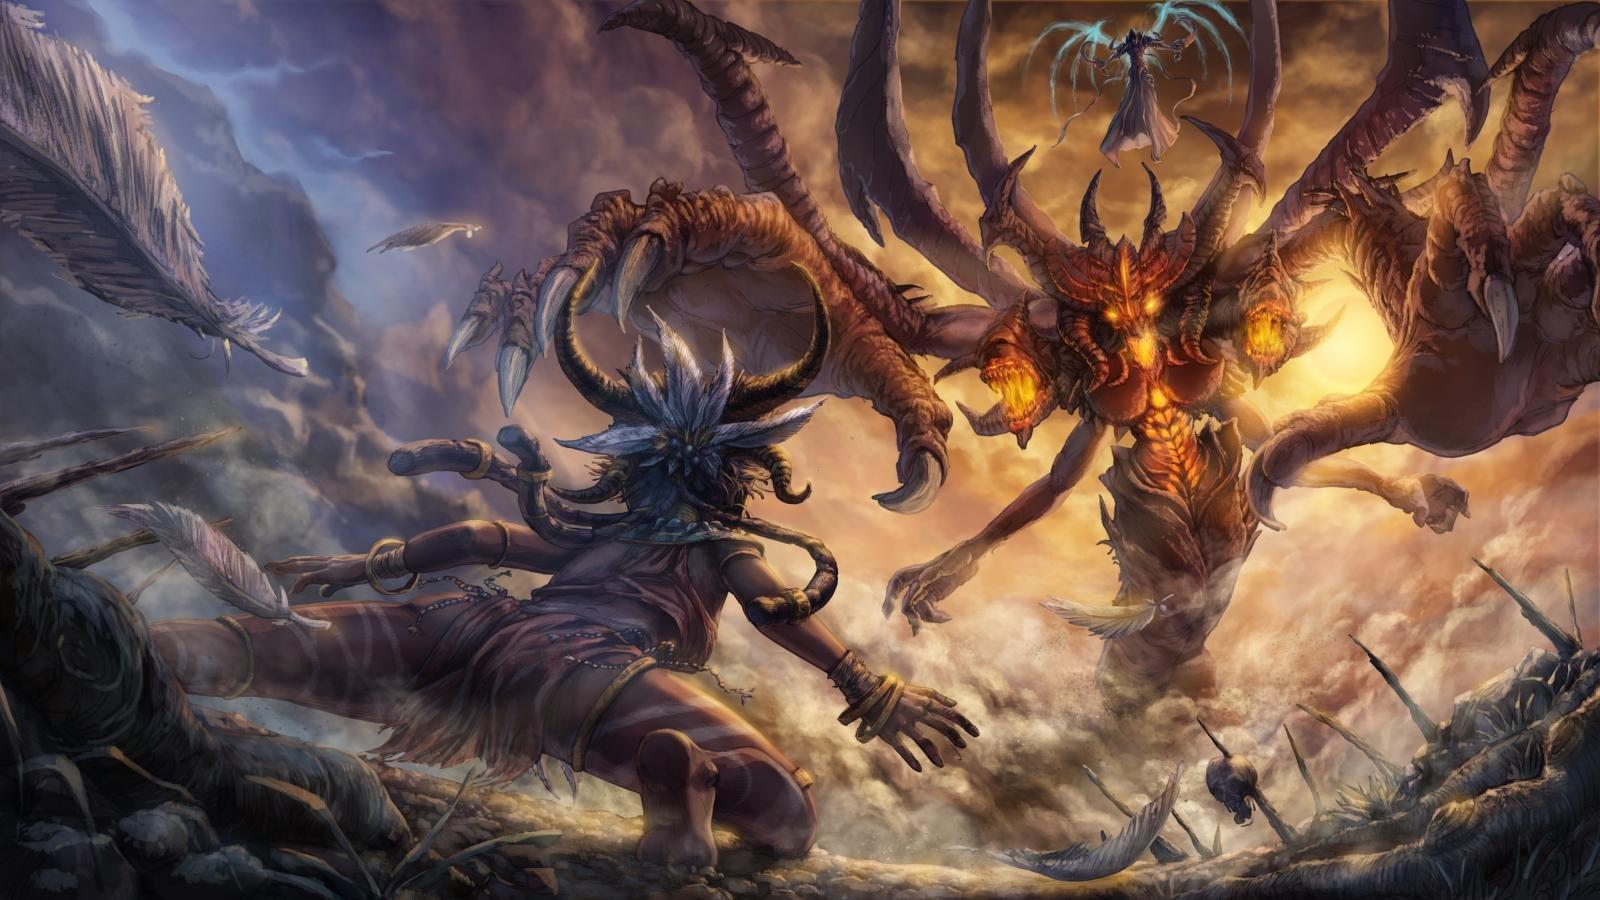 Download Hd Diablo Diablo 3 Witch Doctor Art 1600x900 Download Hd Wallpaper Wallpapertip